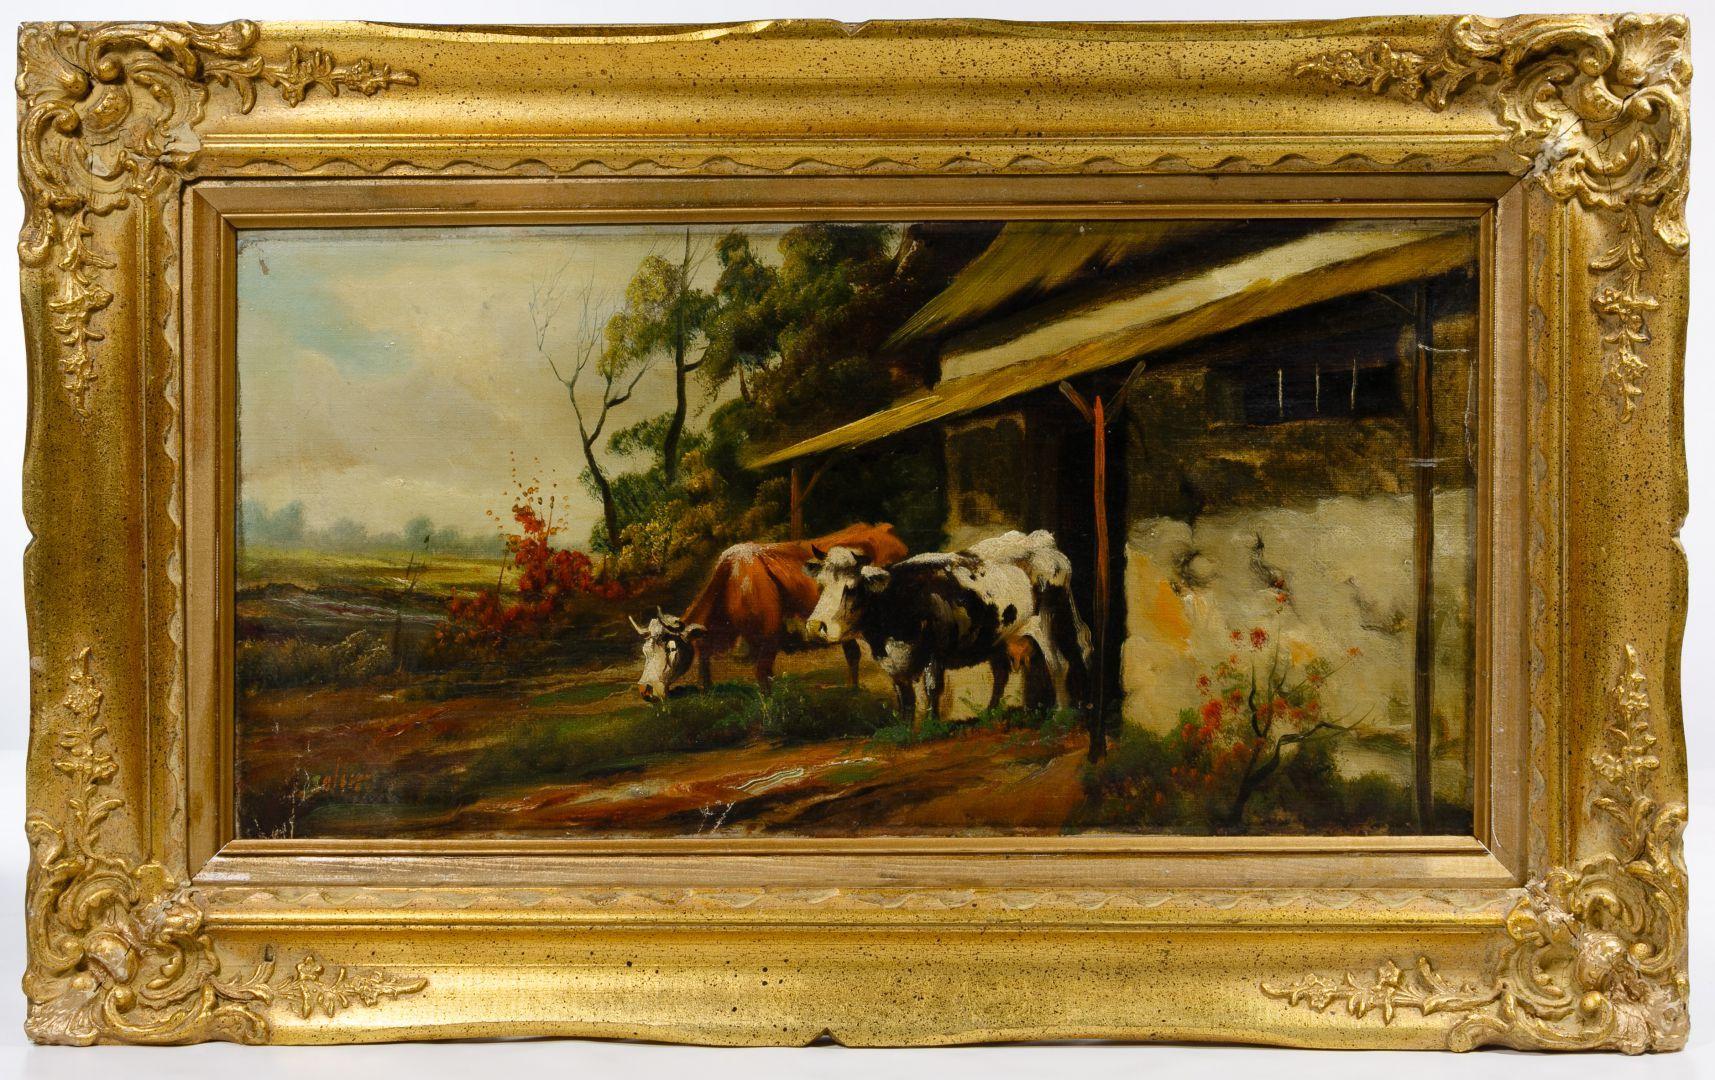 Lot 262 Unknown Artist European 20th Century Oil On Canvas